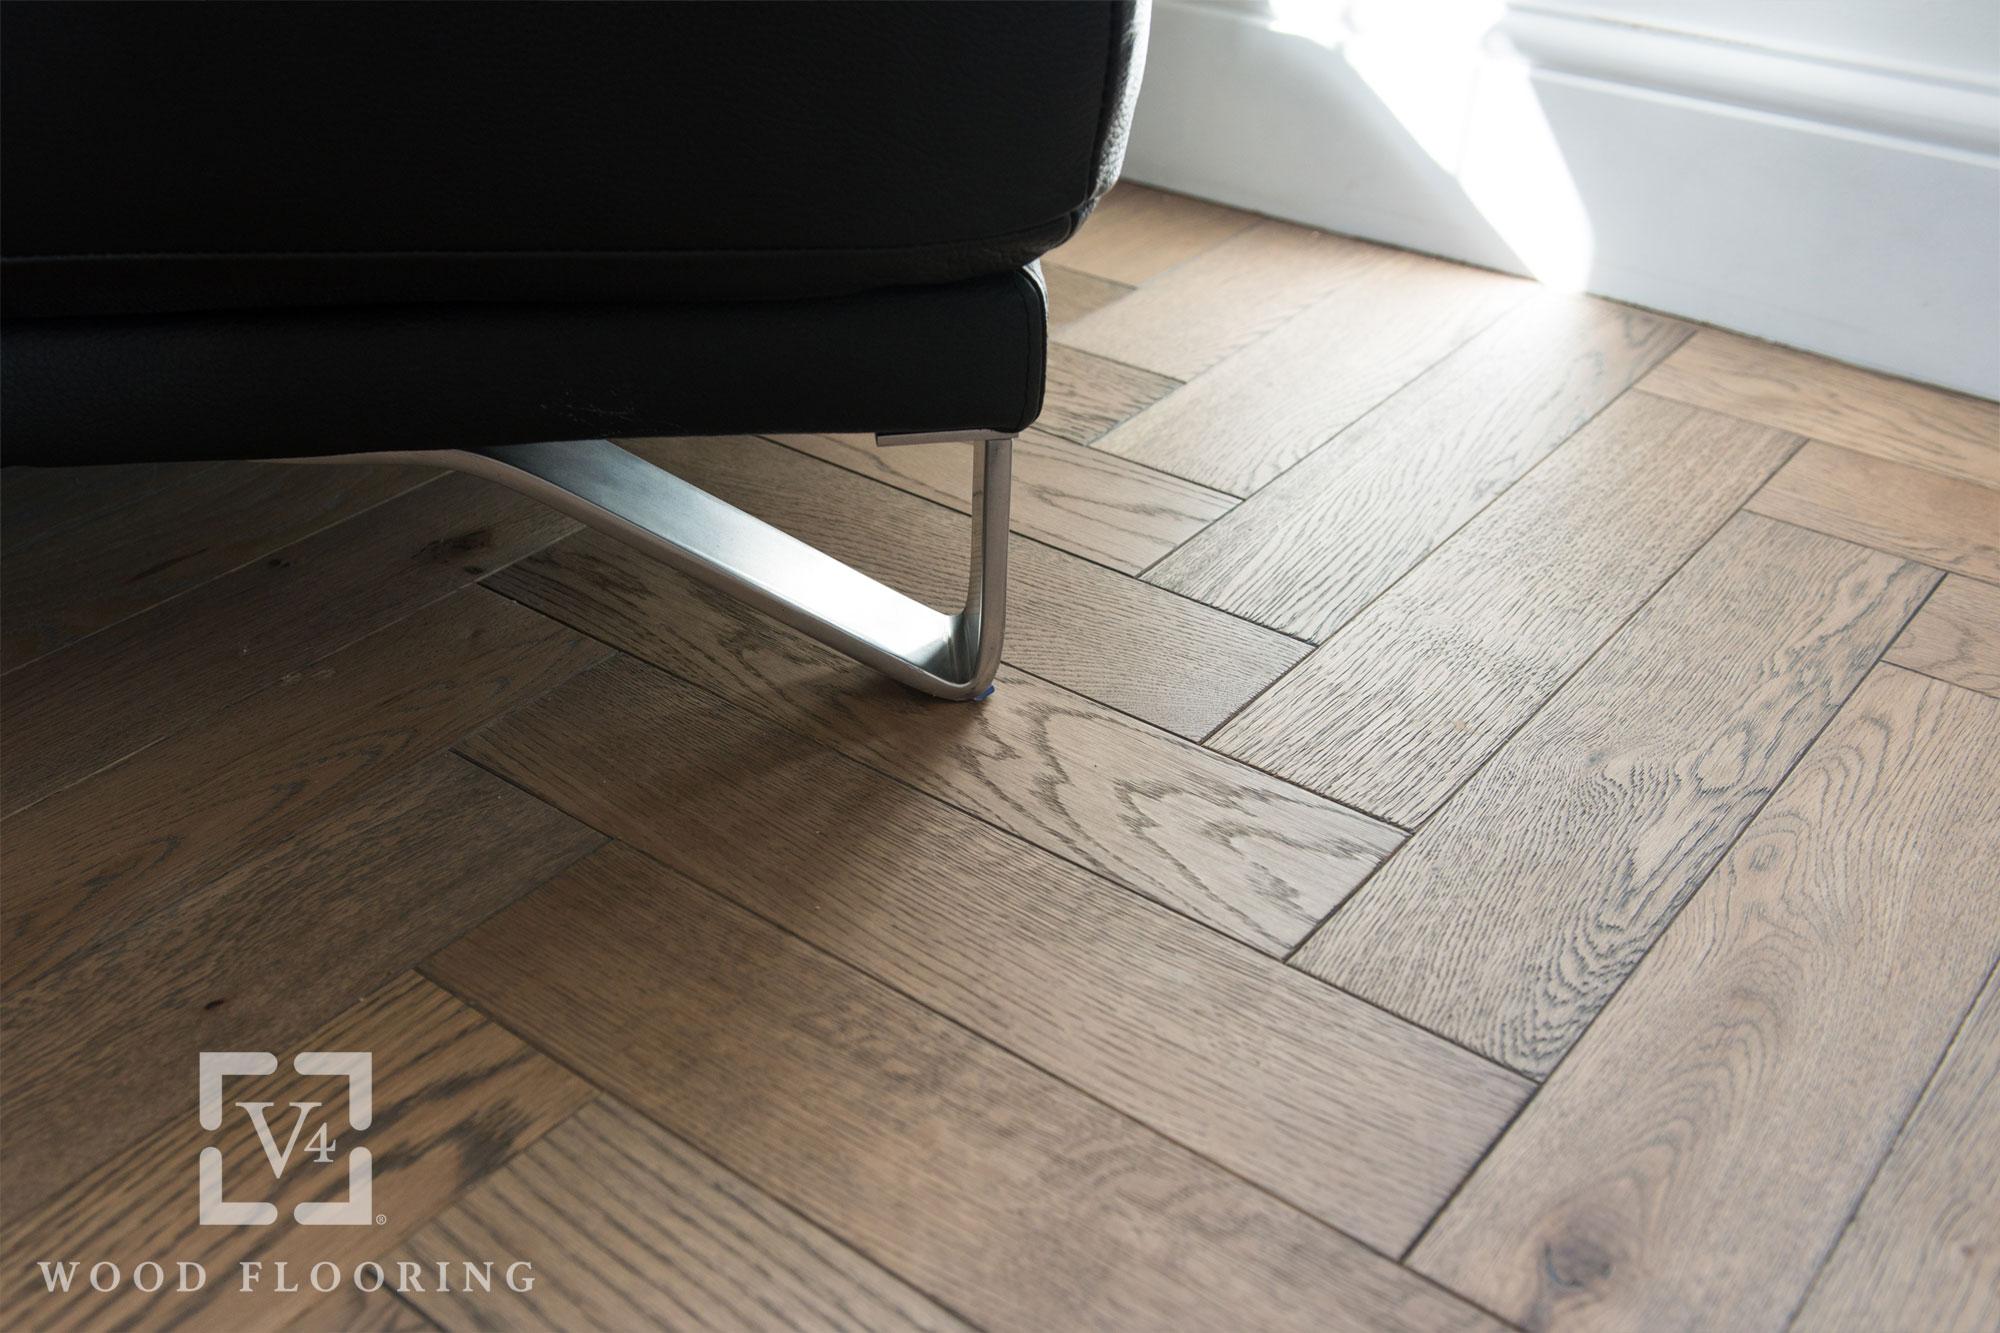 V4 London Wood Flooring Zigzag Zb101